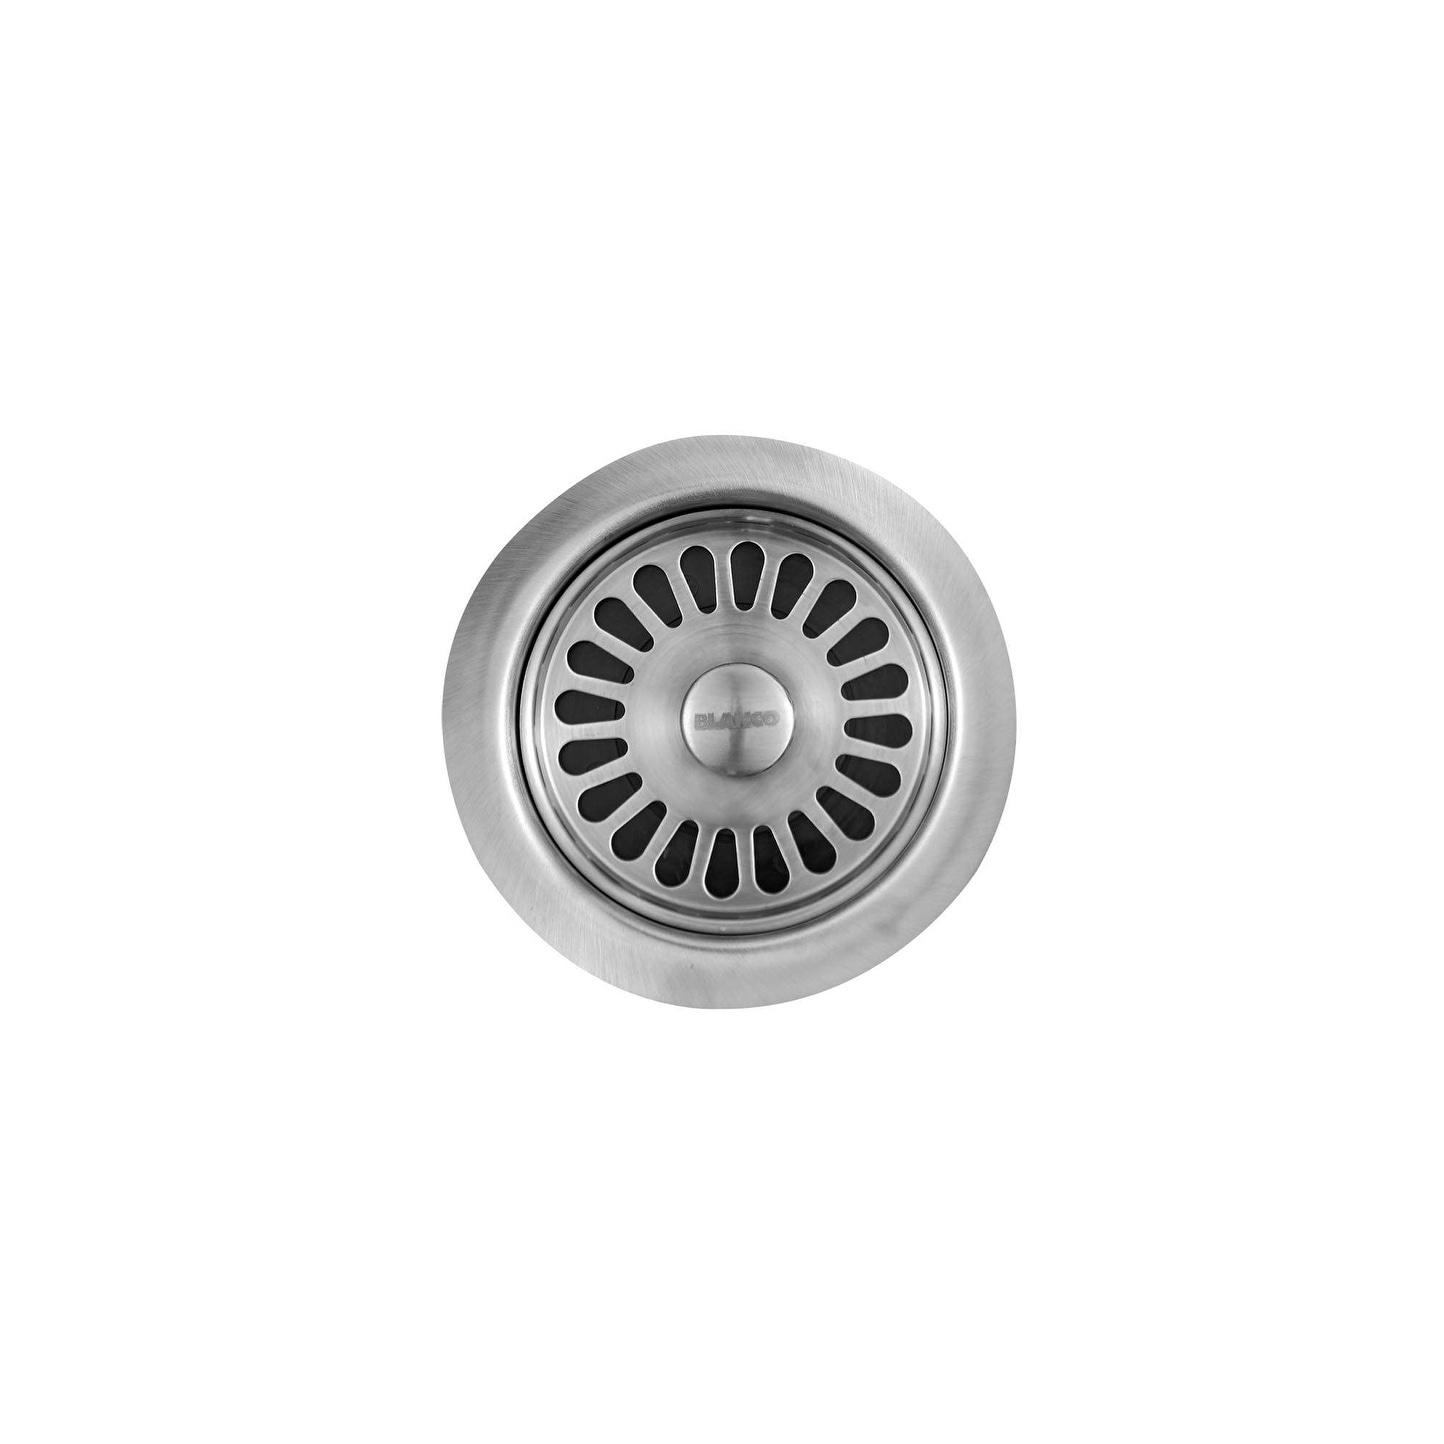 Blanco Stainless Steel Sink Waste Flange (Stainless Steel.